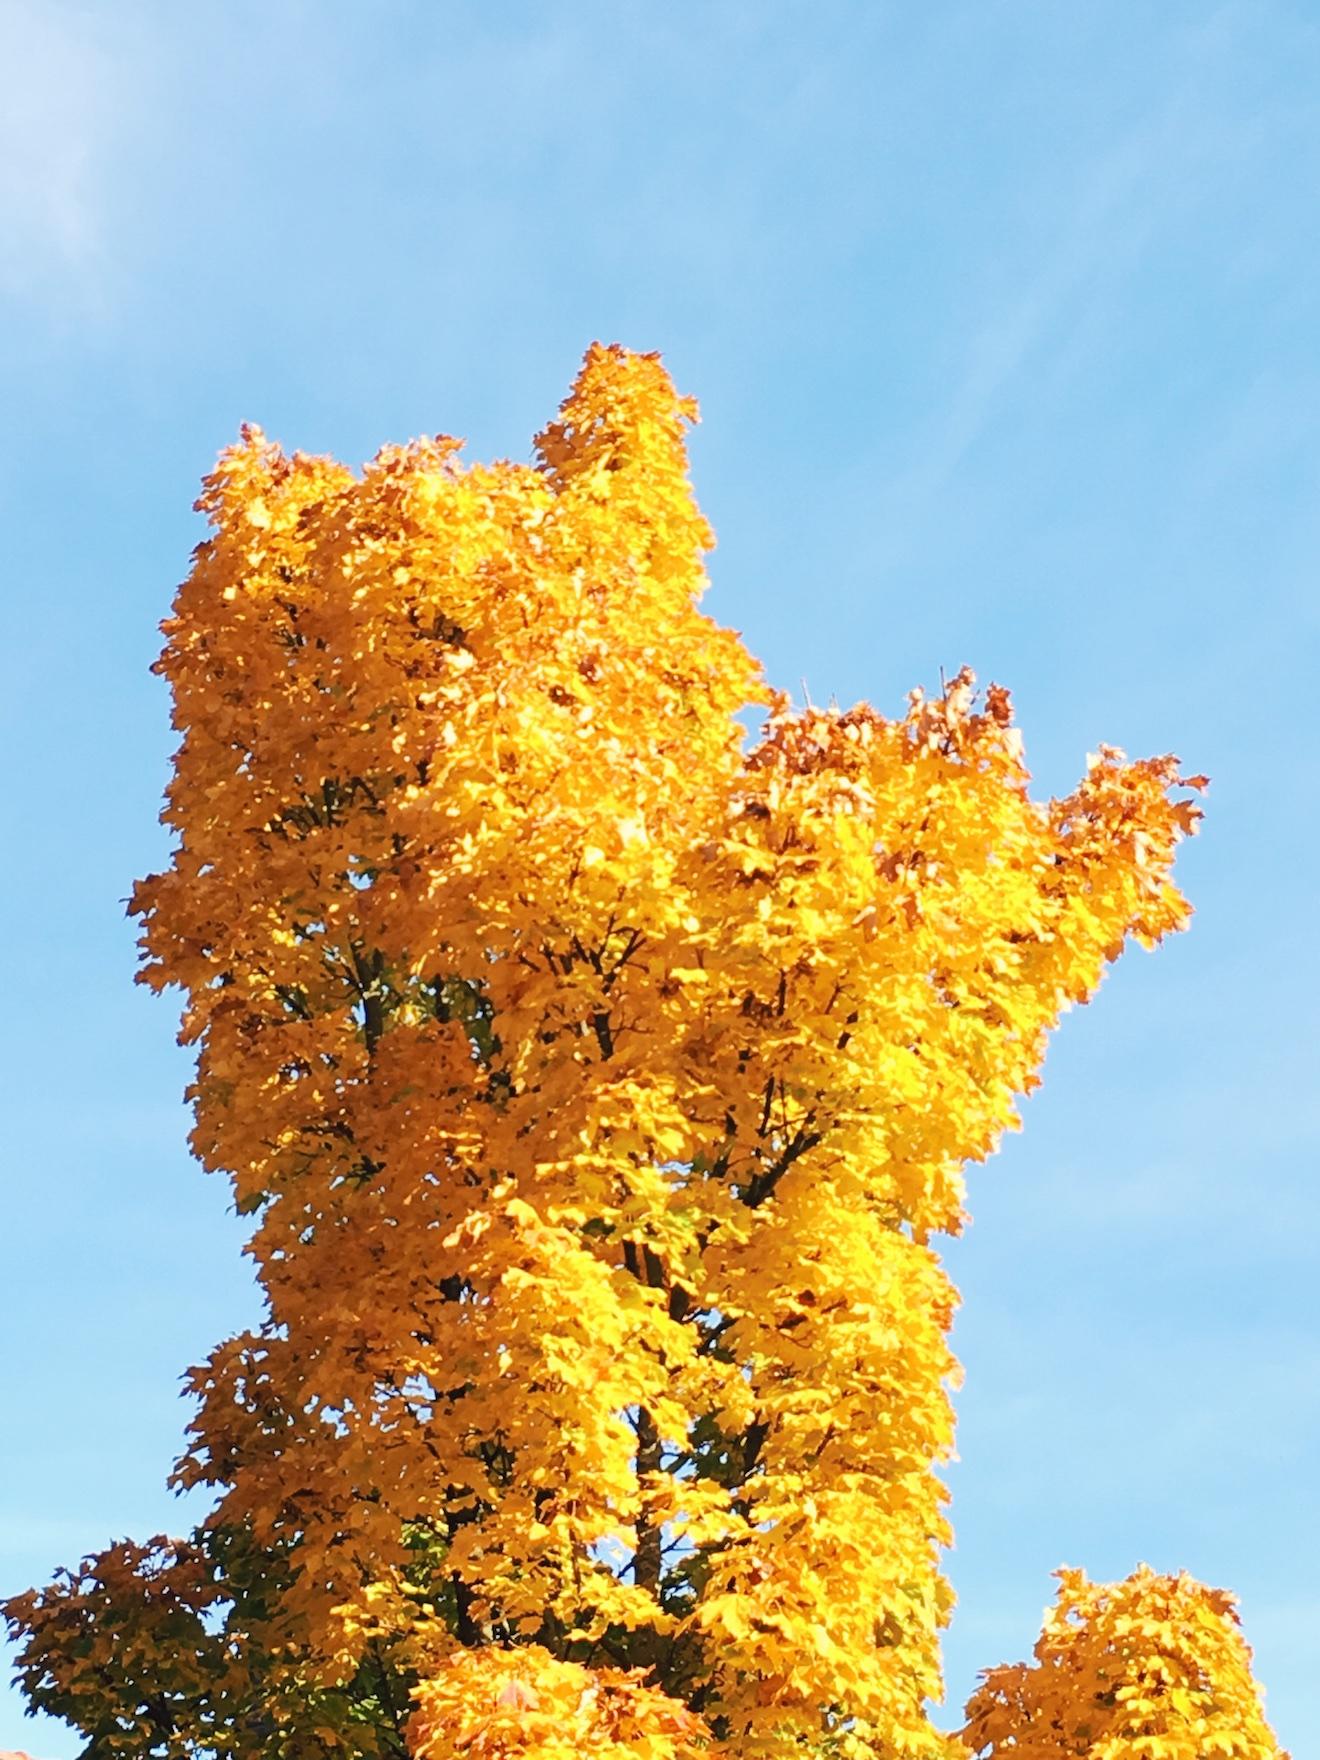 herfstkleuren bos